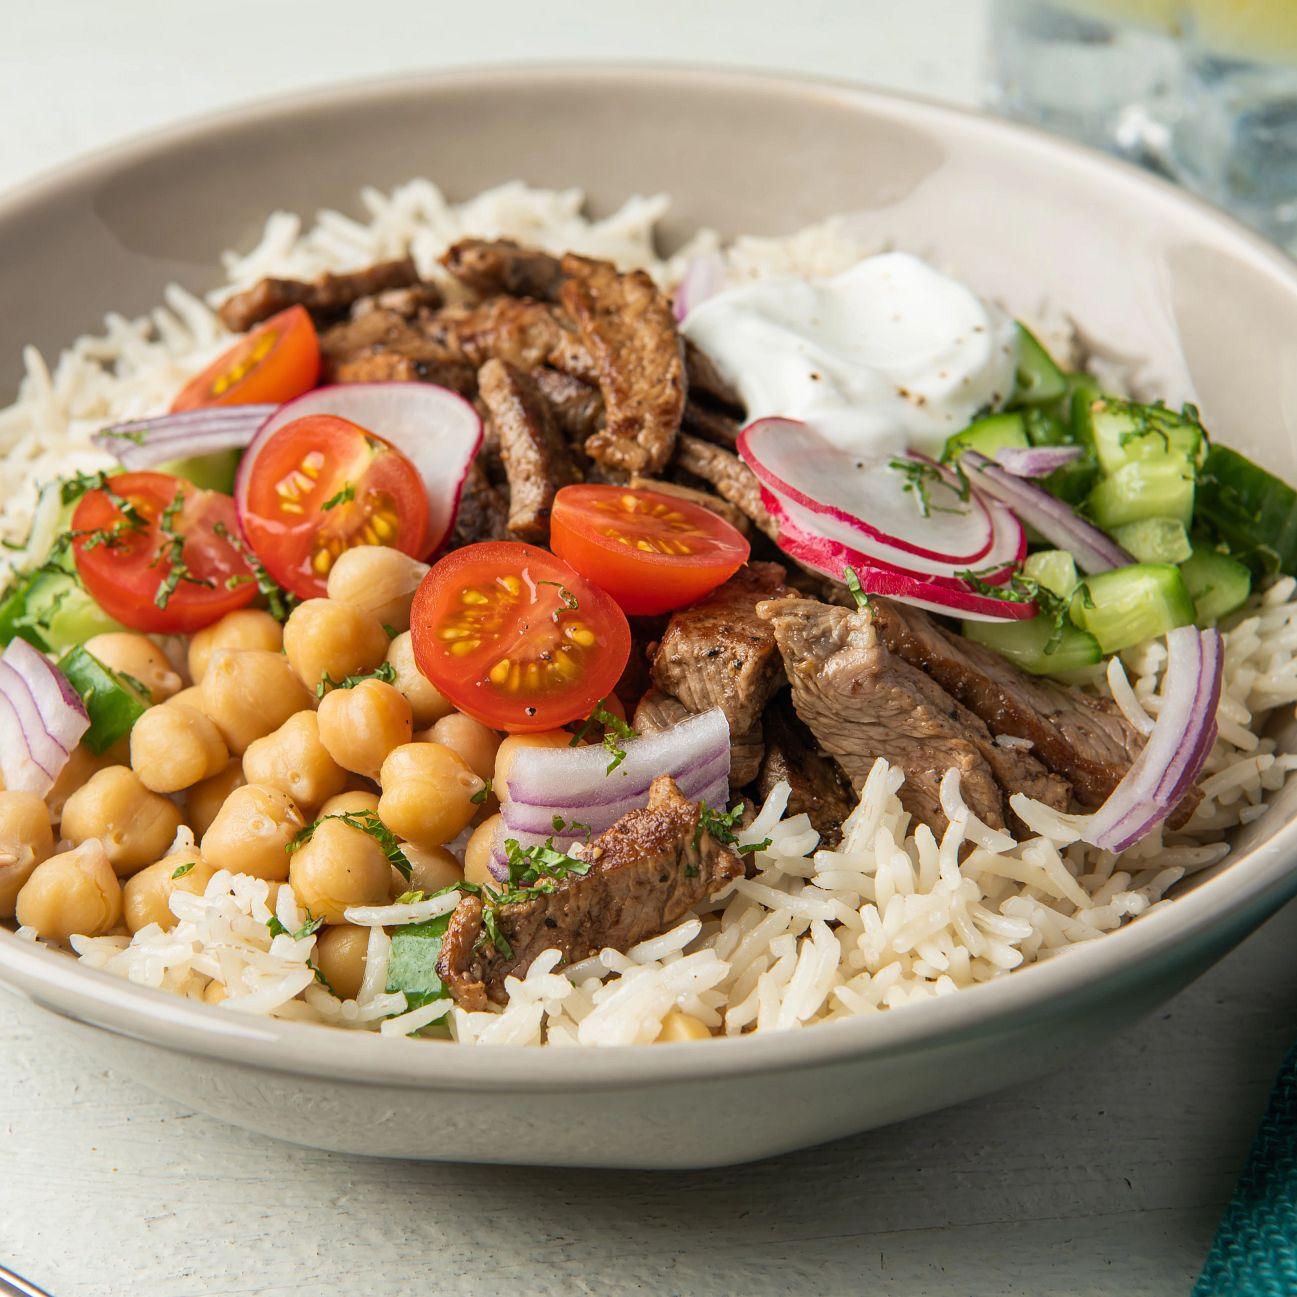 shawarma steak and basmati rice bowl